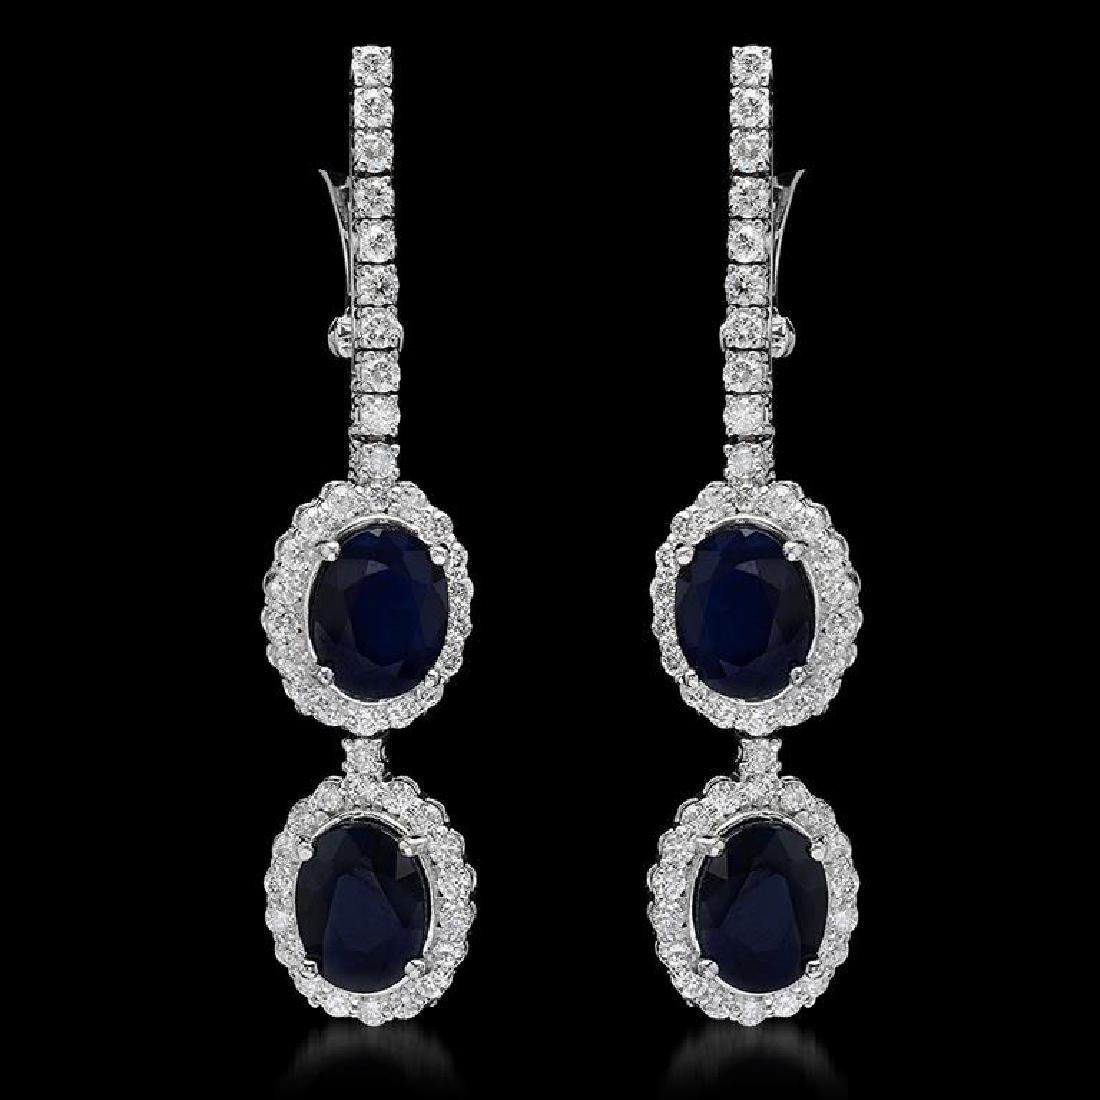 14K Gold 6.98ct Sapphire 1.95ct Diamond Earrings